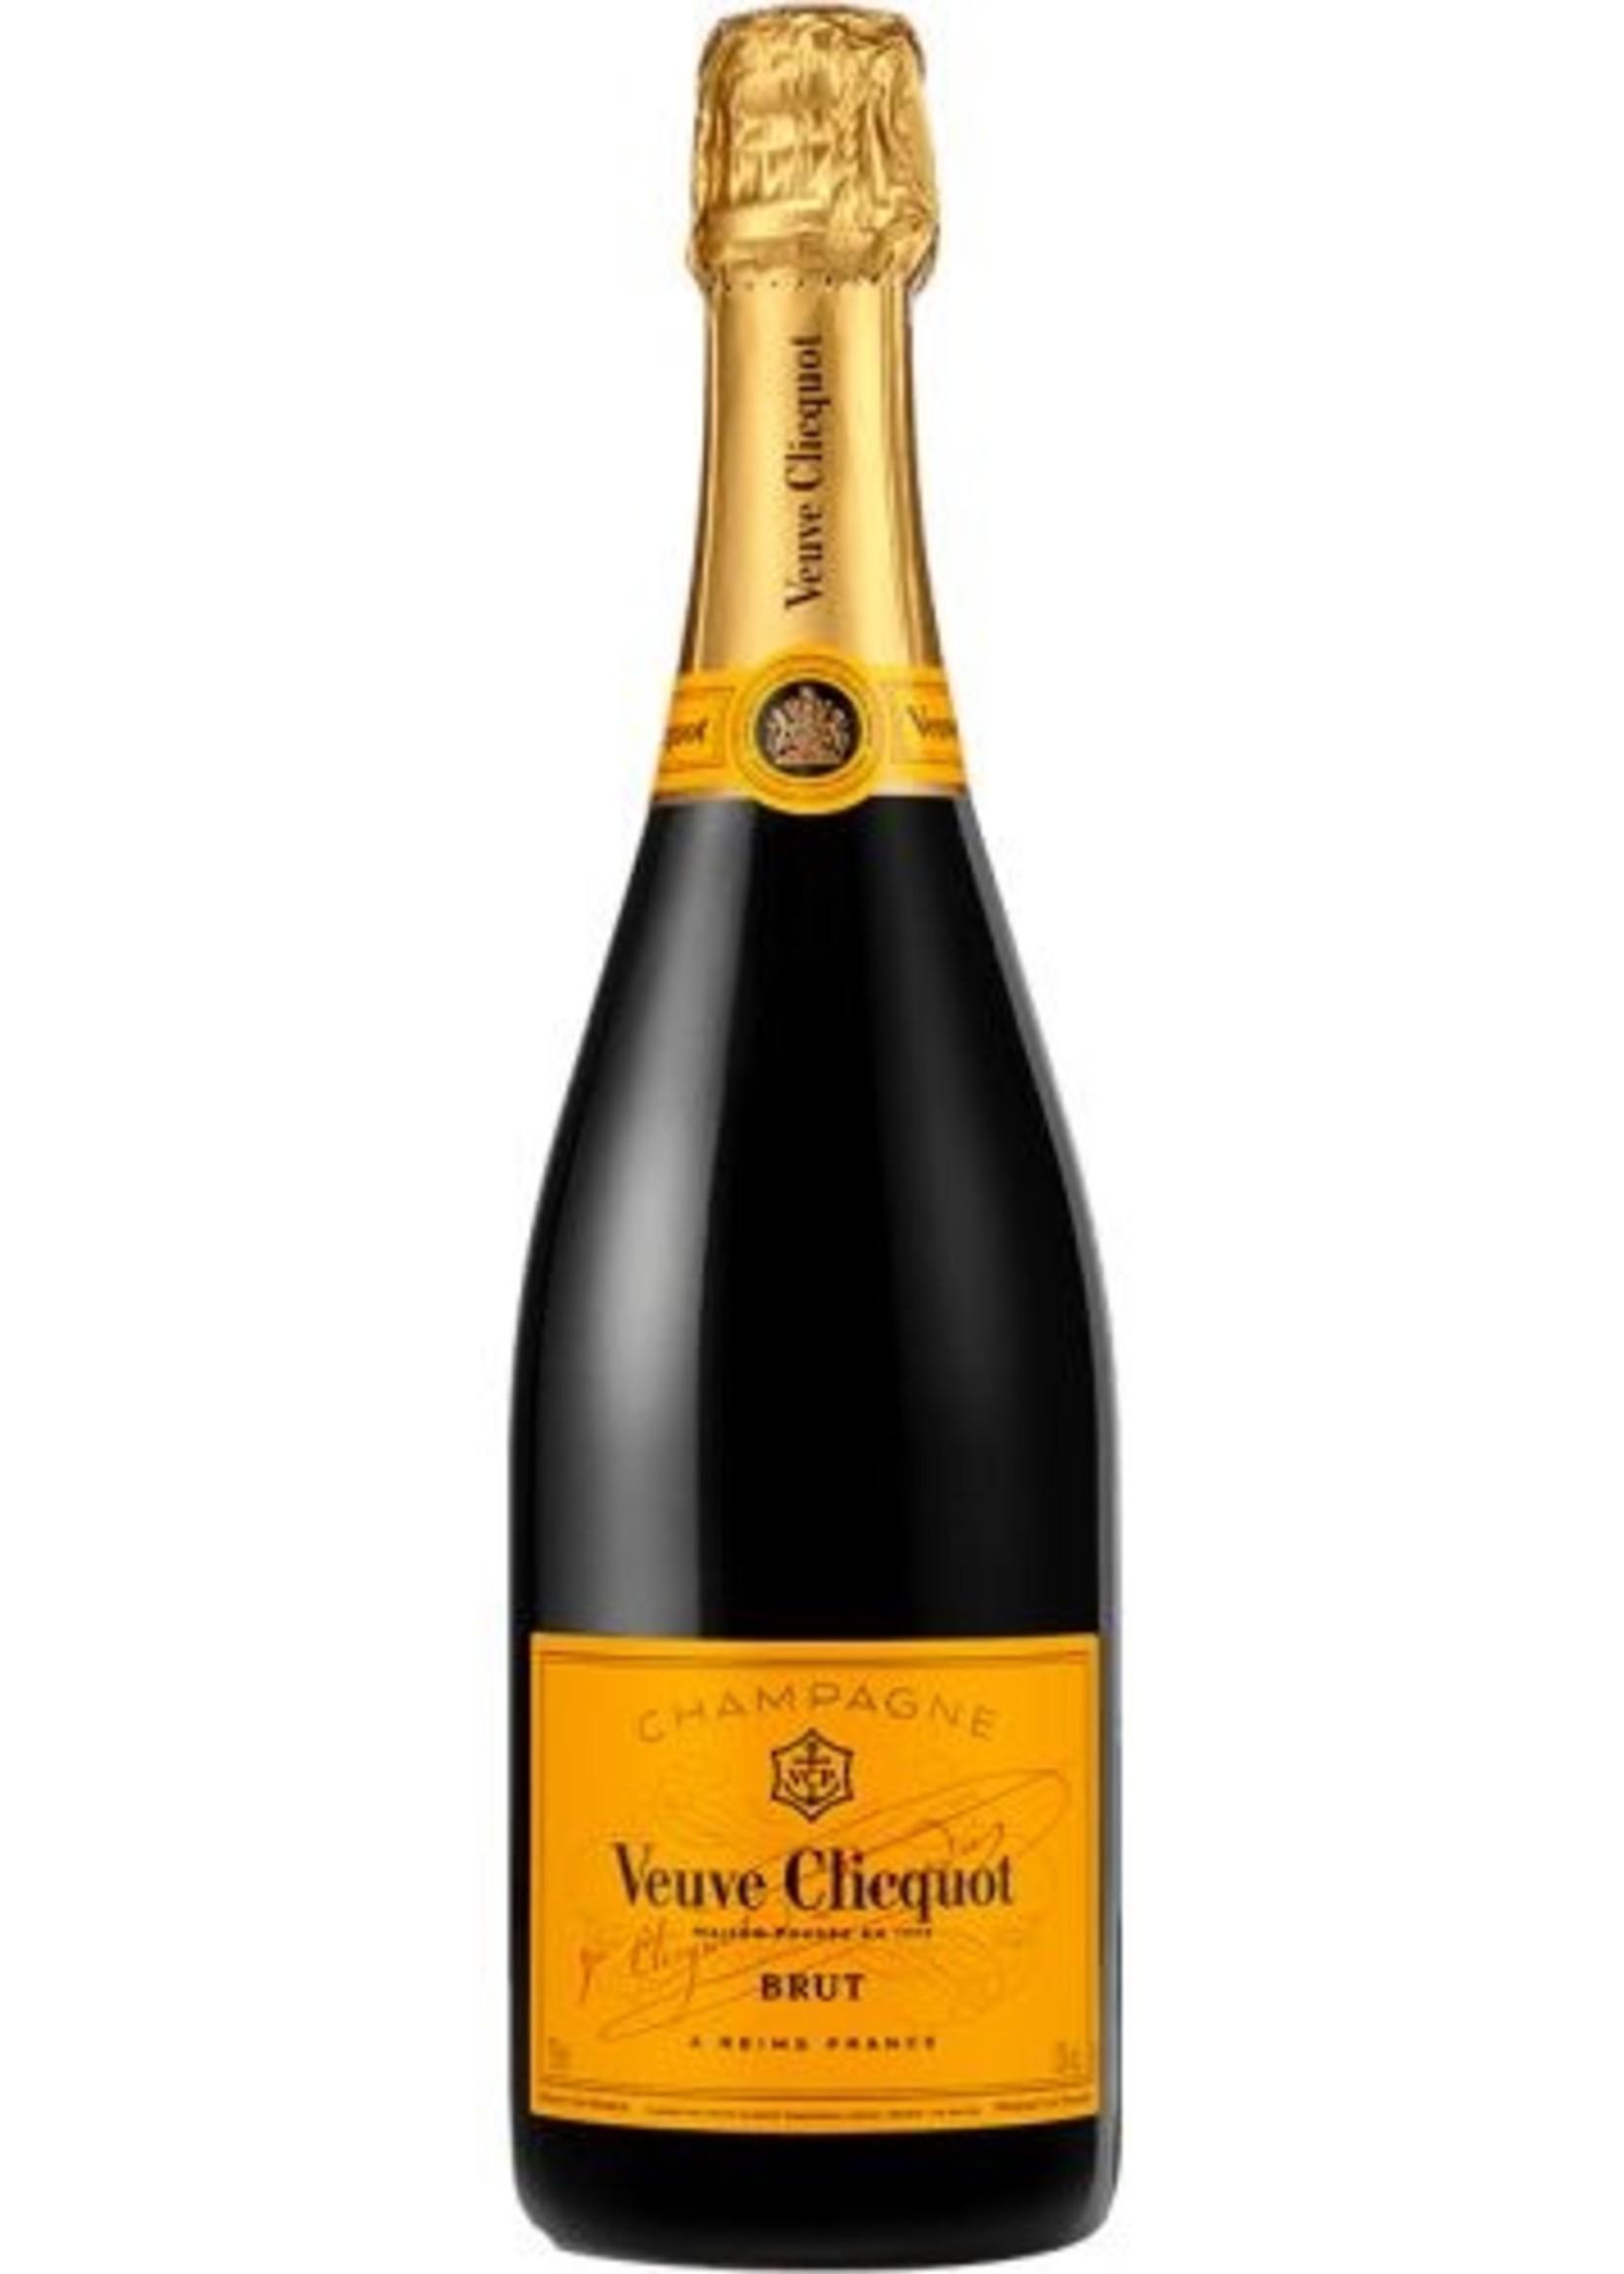 Veuve Clicquot Brut 750